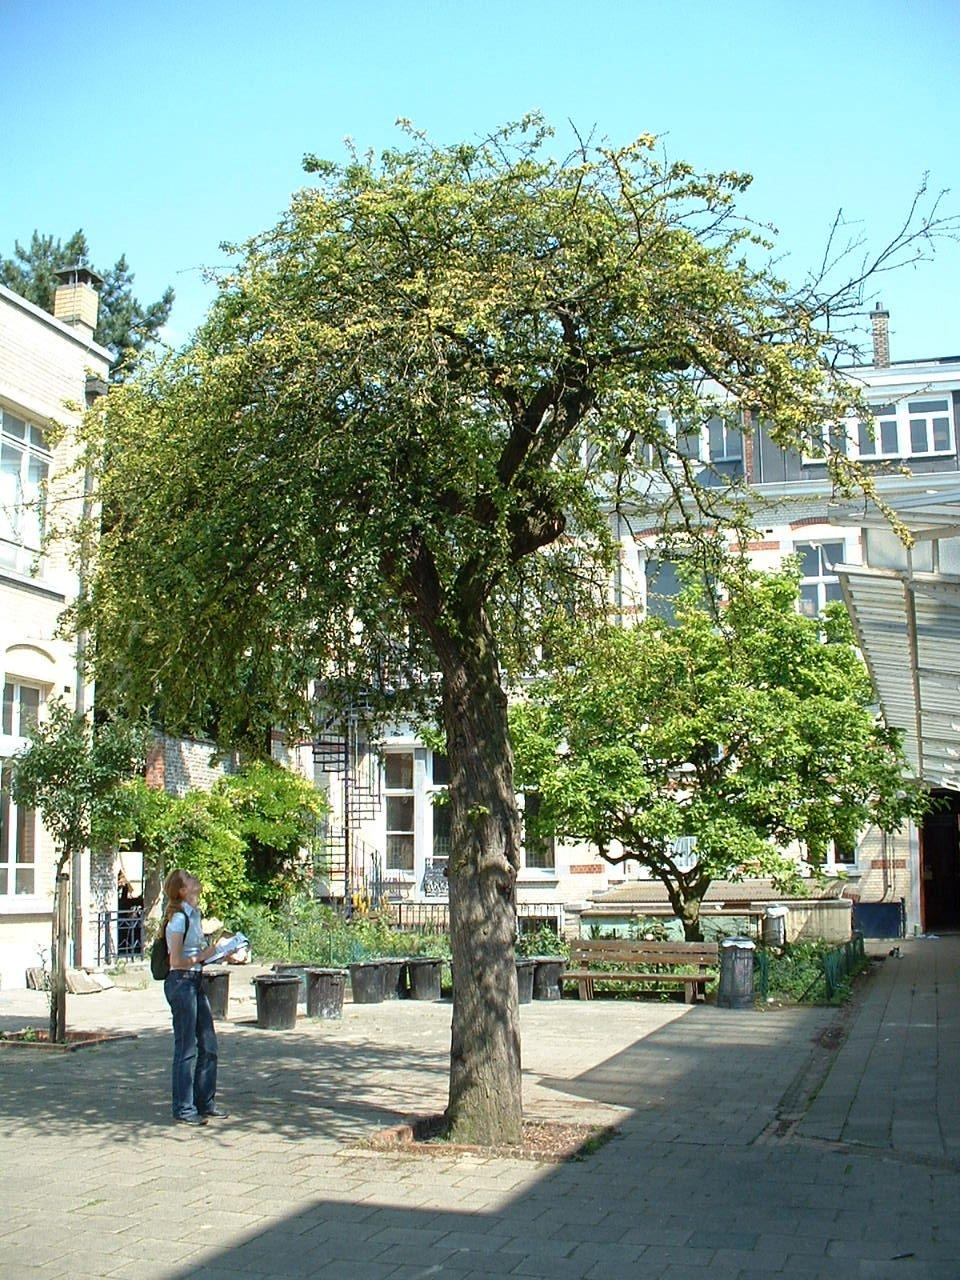 Crataegus laevigata 'Plena' – Schaerbeek, Chaussée de Haecht, 235 –  25 Juin 2002